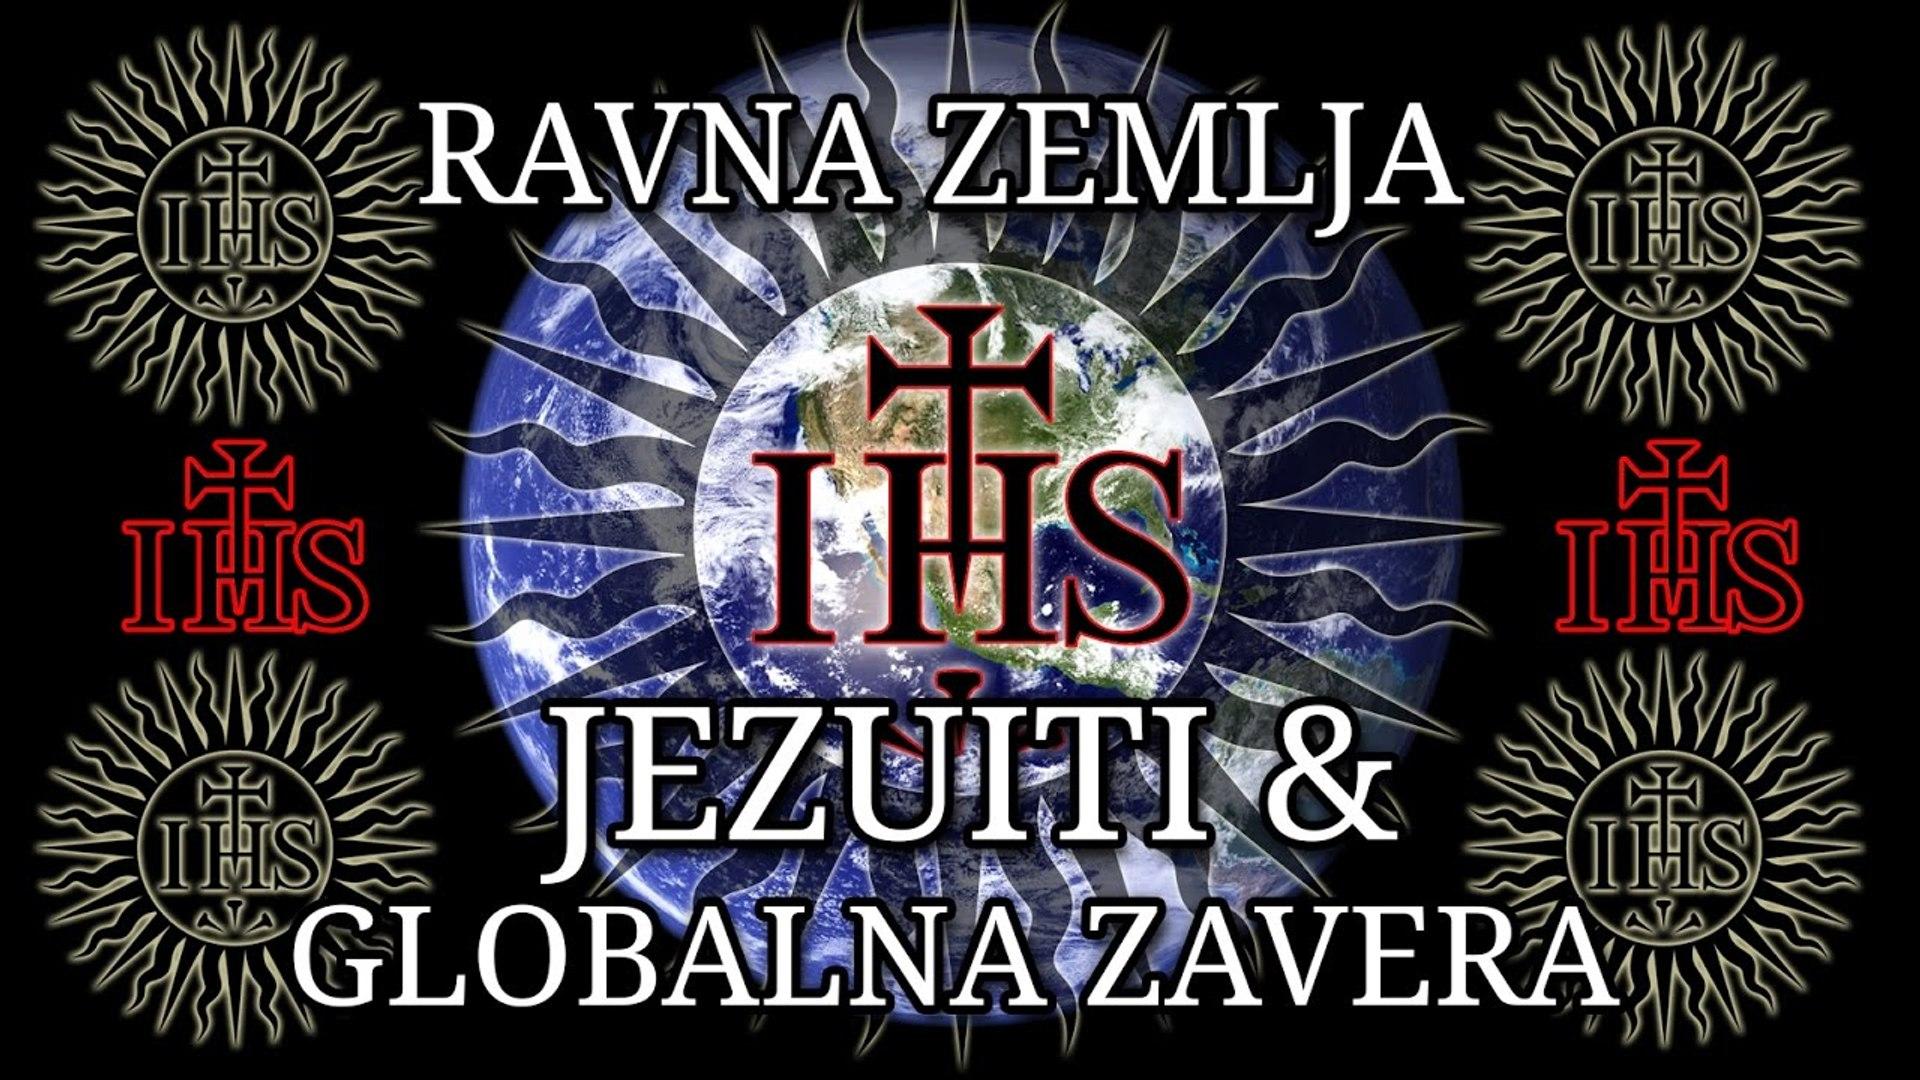 RAVNA ZEMLJA -- Jezuiti & Globalna zavera